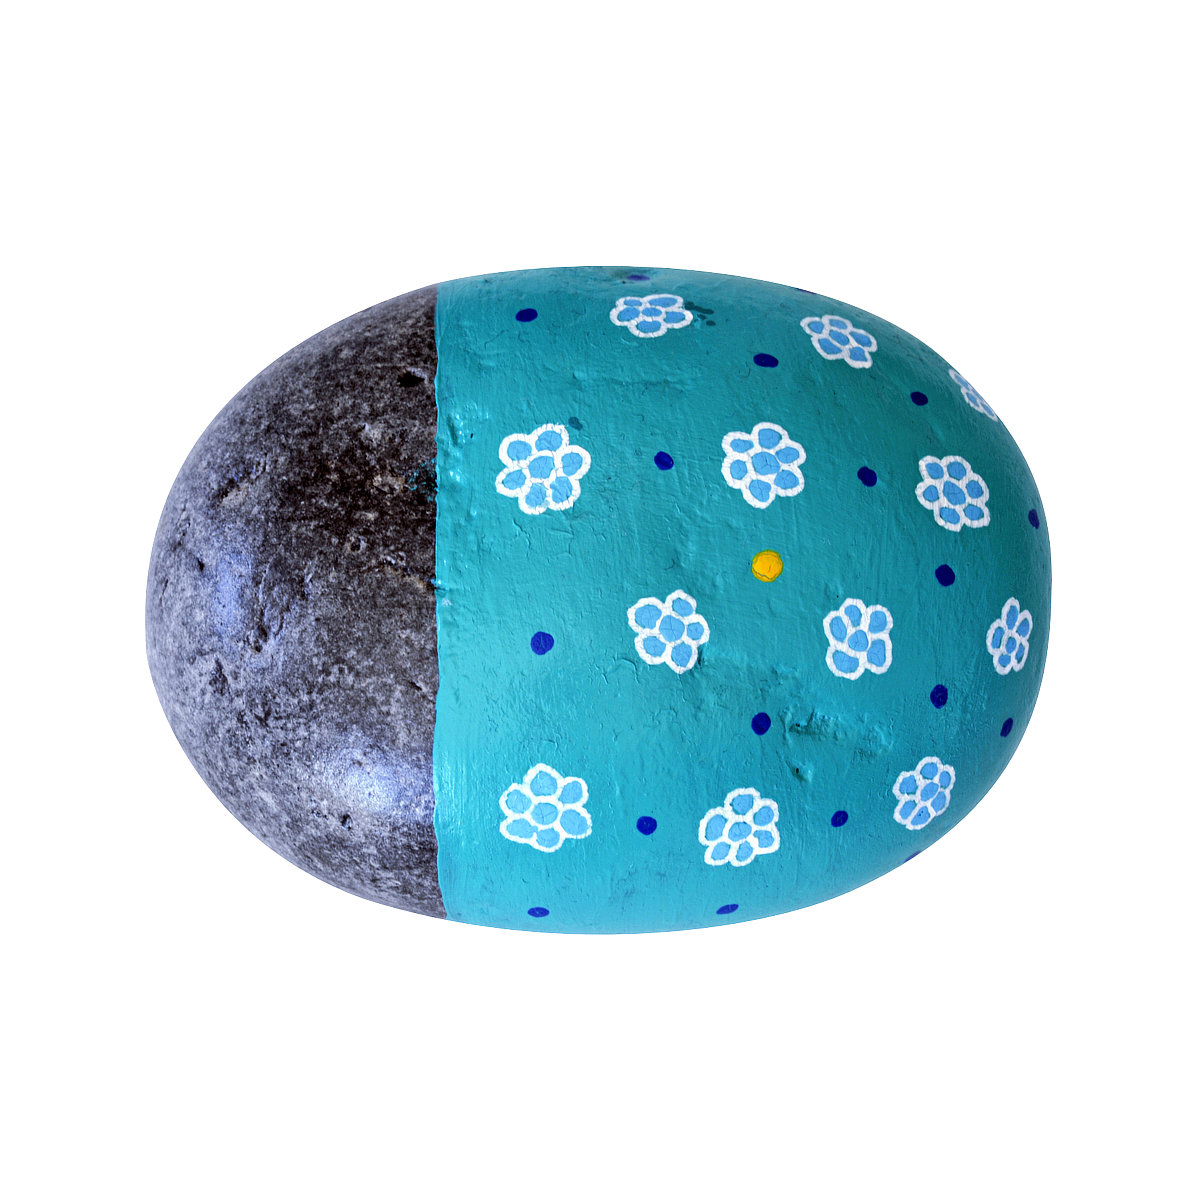 Blue harmony egg